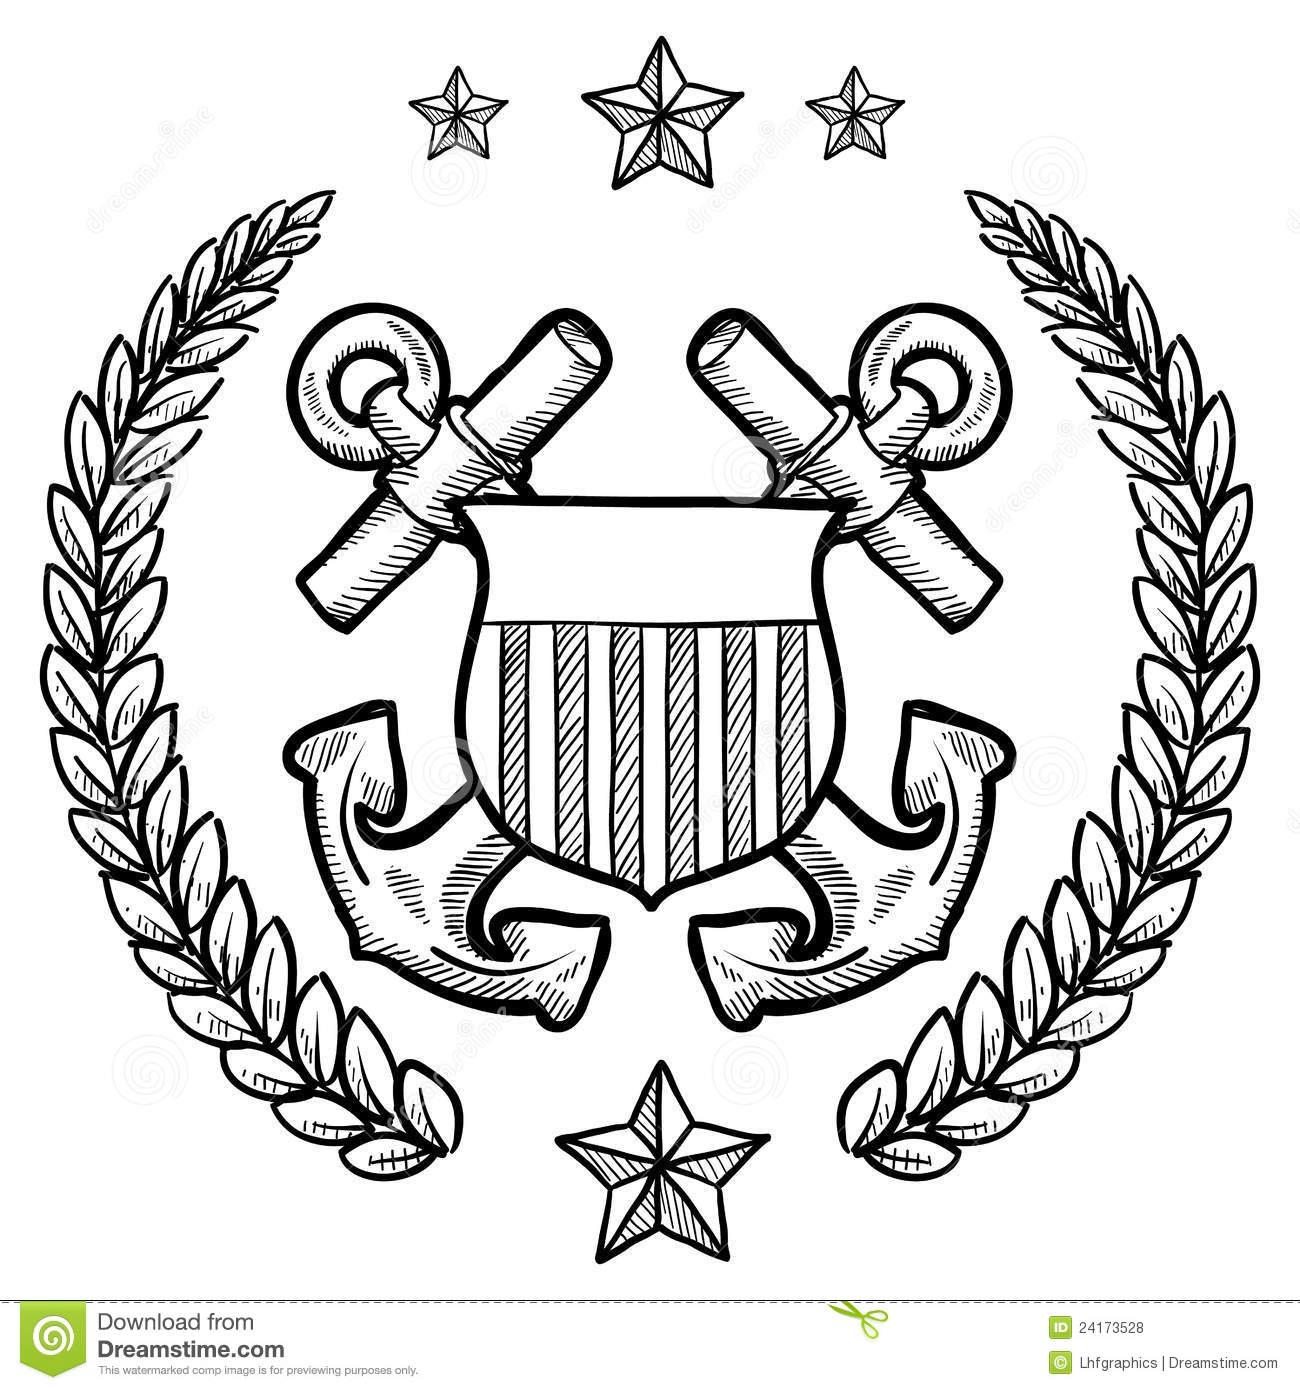 Us Navy Insignia Clipart - Clipart Kid